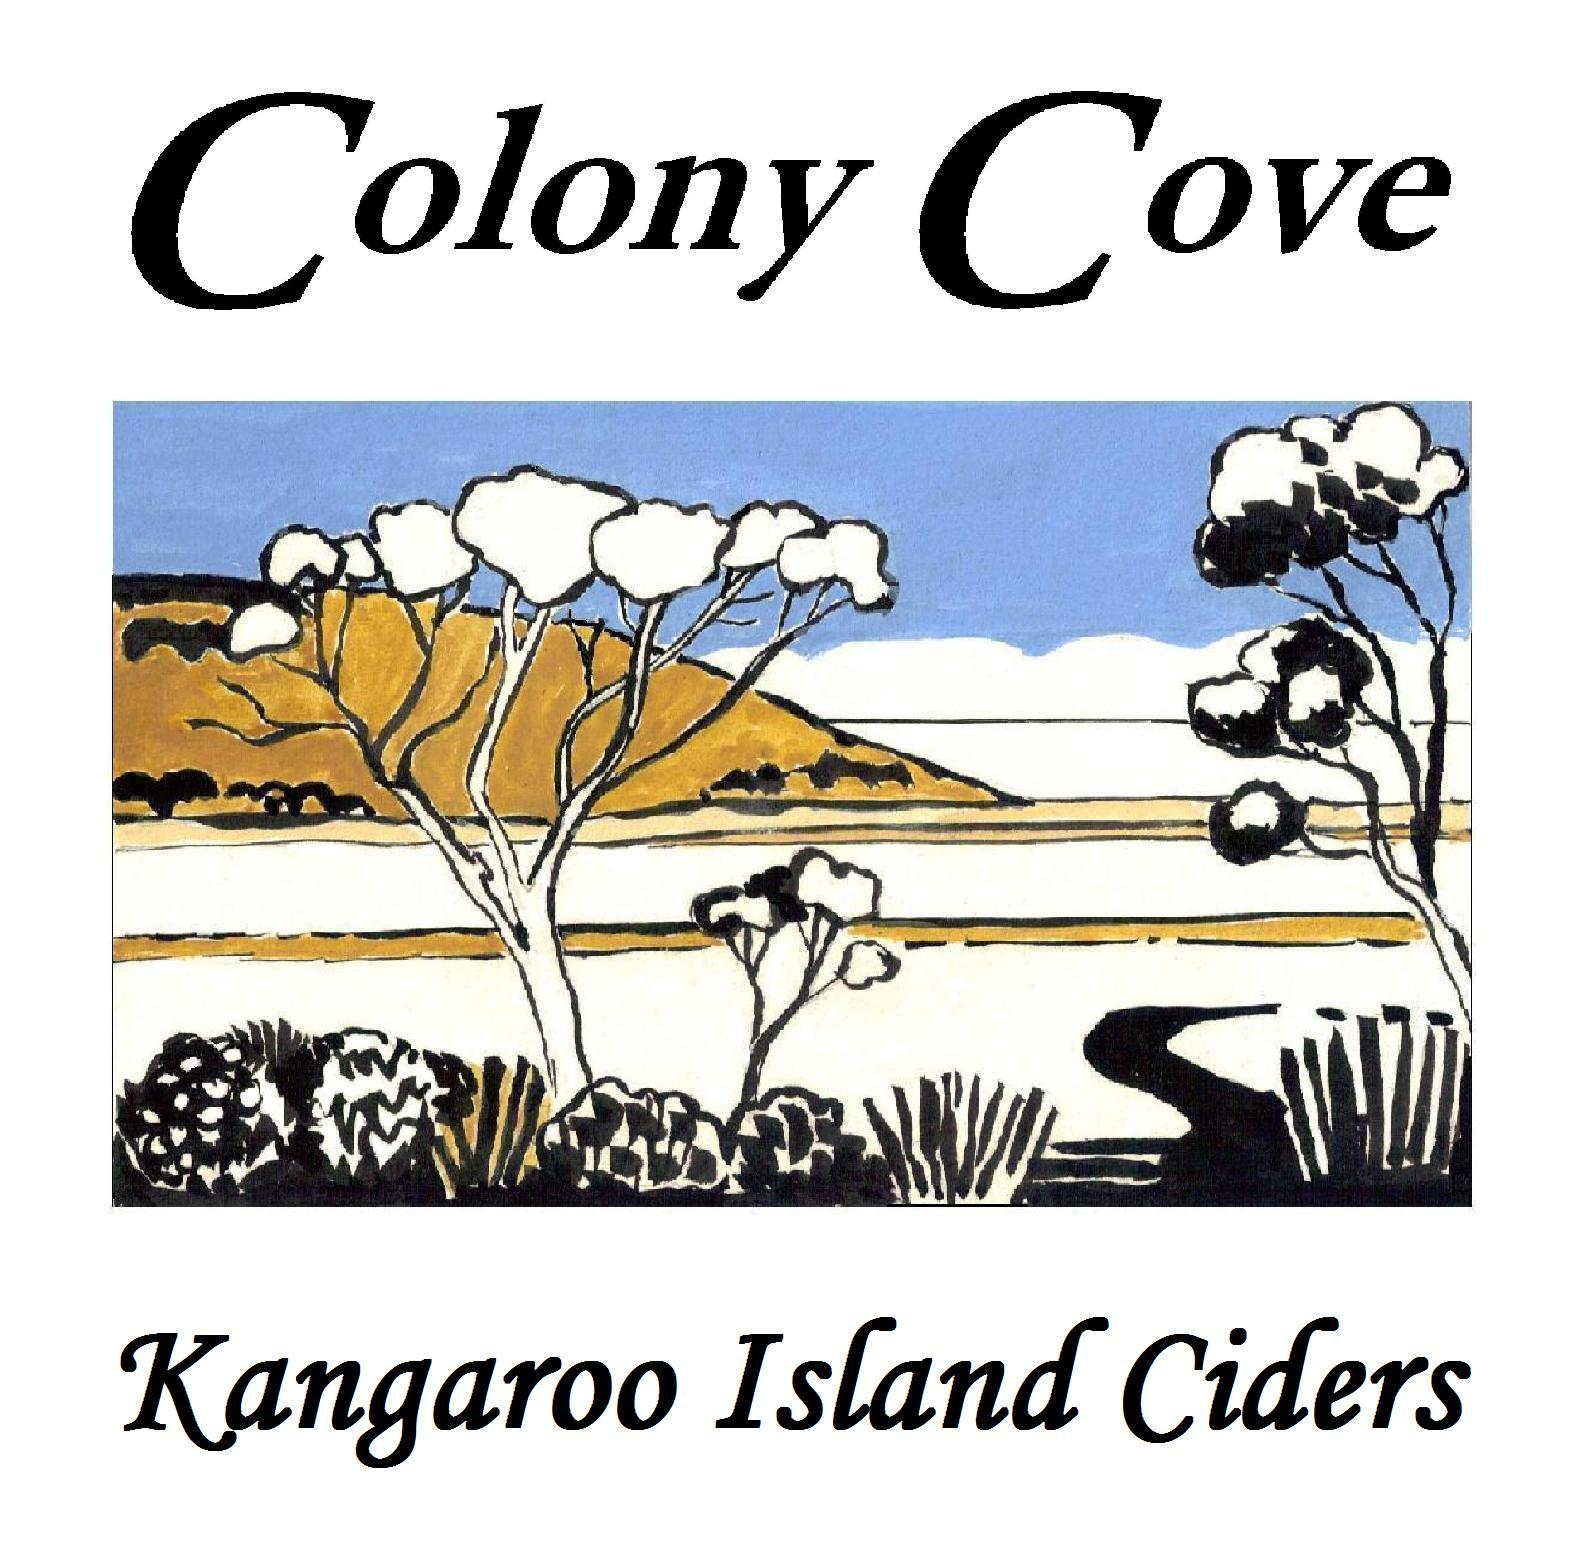 Kangaroo Island Ciders